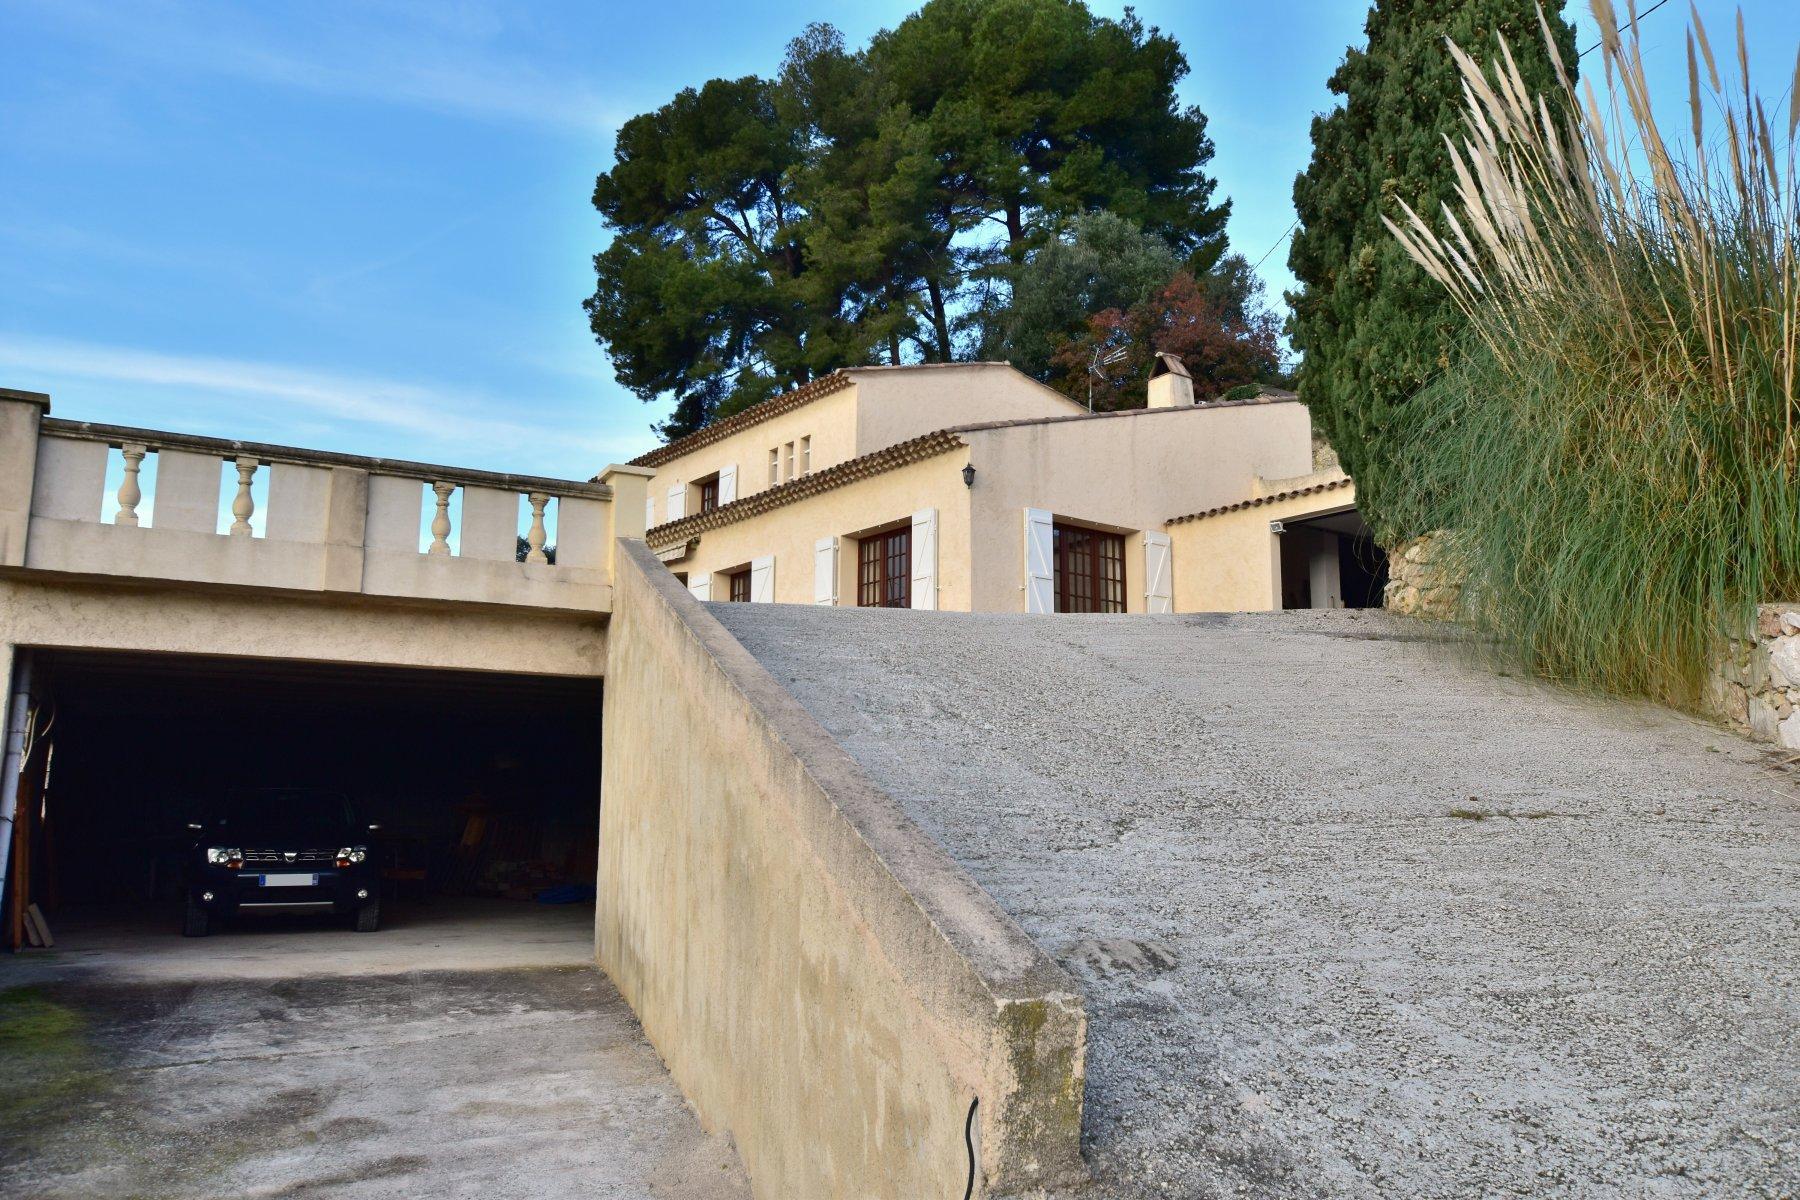 Villa 5 pièces 200 m² - piscine - vue mer !